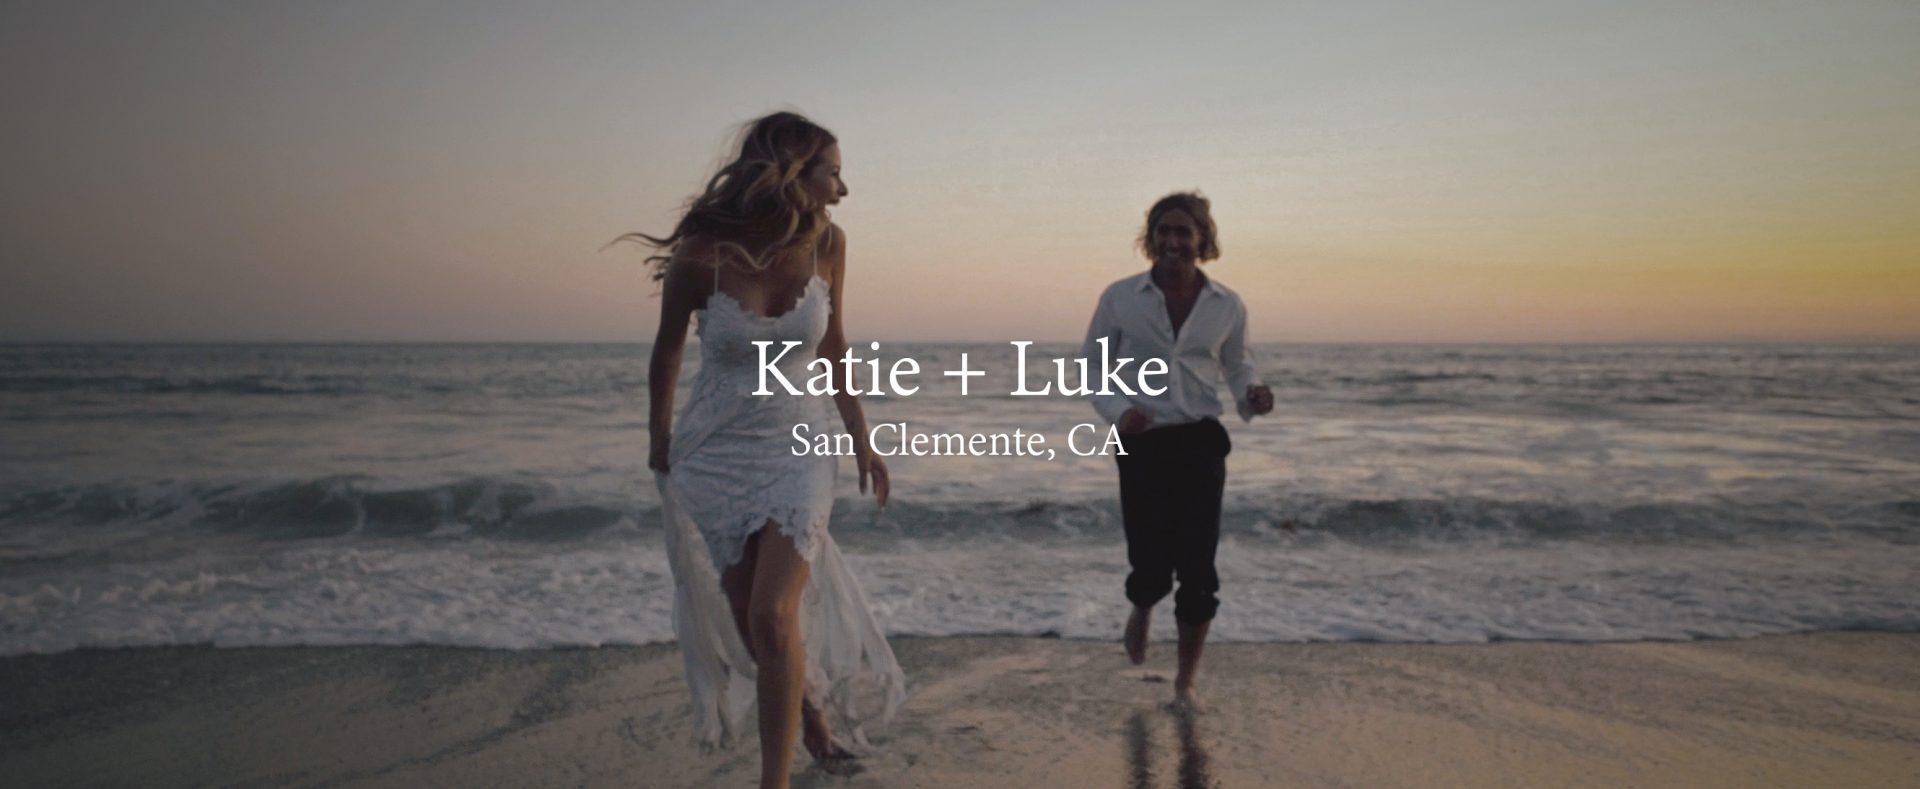 Katie + Luke | San Clemente, California